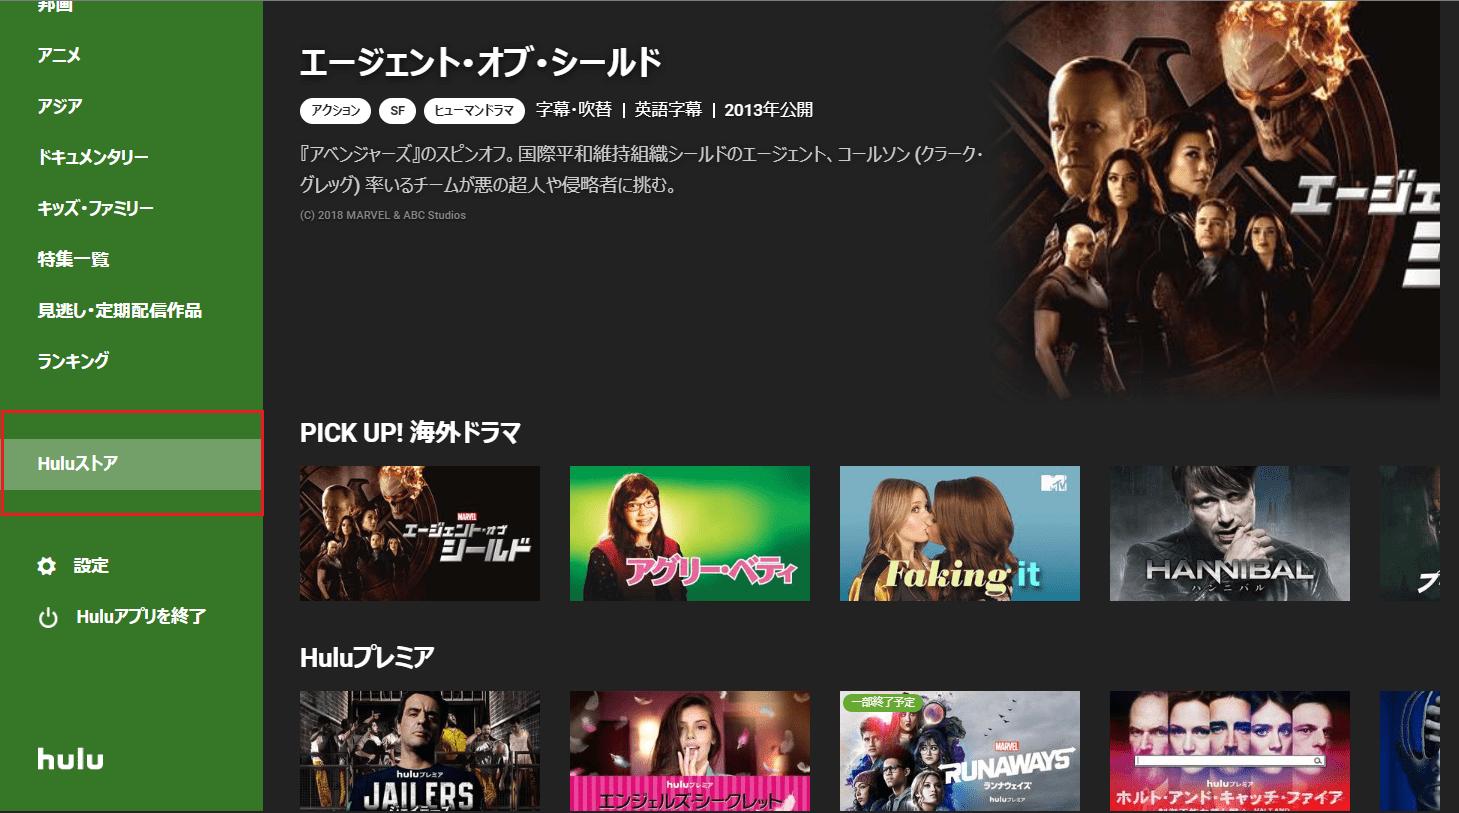 【Huluストアとは?】都度課金(TVOD)サービス「Huluストア」が6月10日提供開始!待望の新サービスの概要を解説|フールーでも最新映画が観れる!|視聴方法:テレビの場合